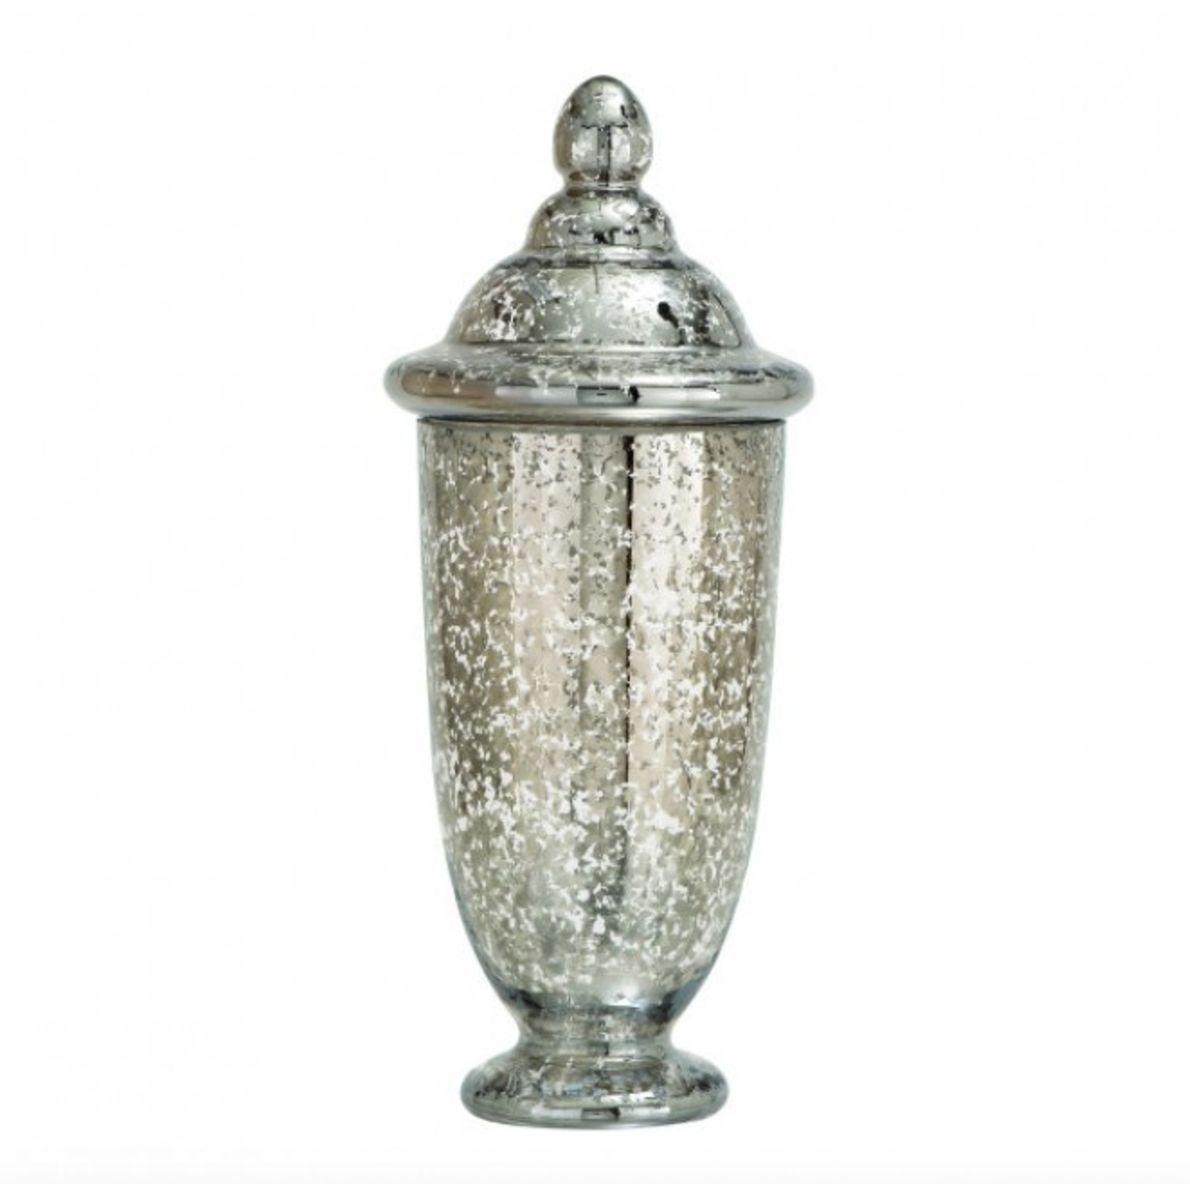 Large Mercury Apothecary Jar Decorated Jars Apothecary Jars